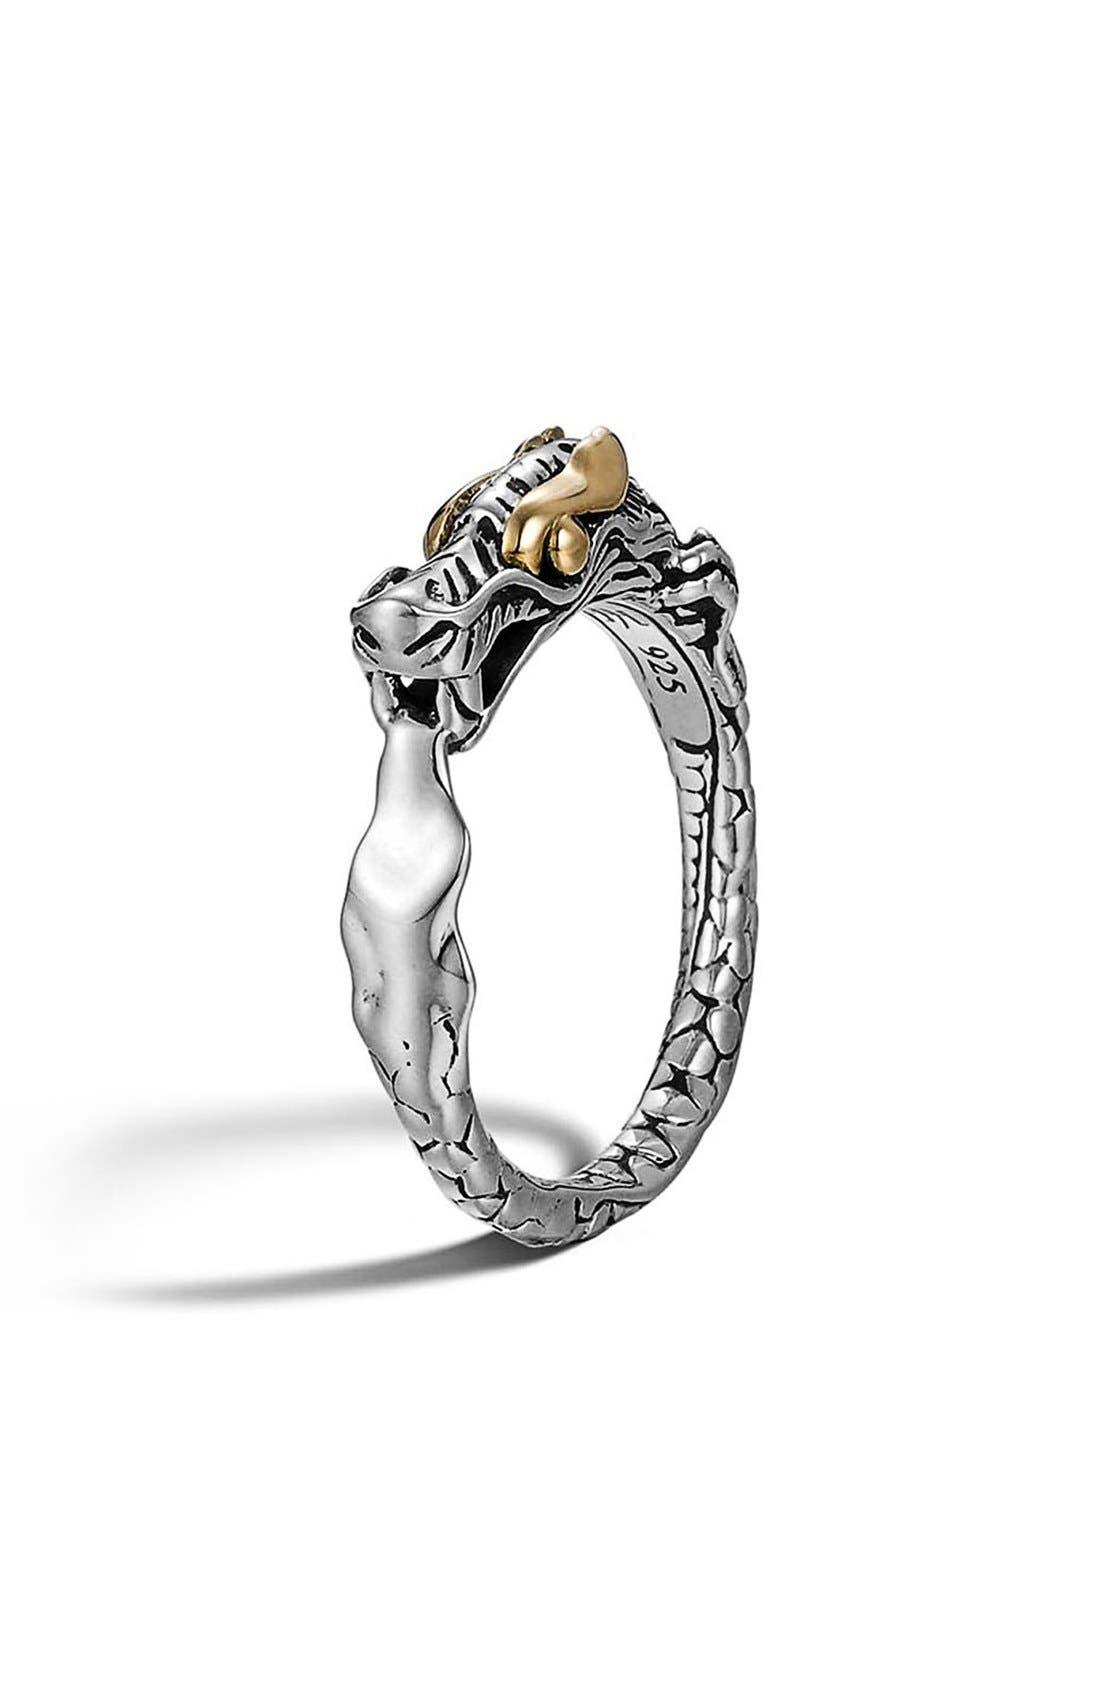 'Legends' Slim Dragon Ring,                         Main,                         color, Silver/Gold